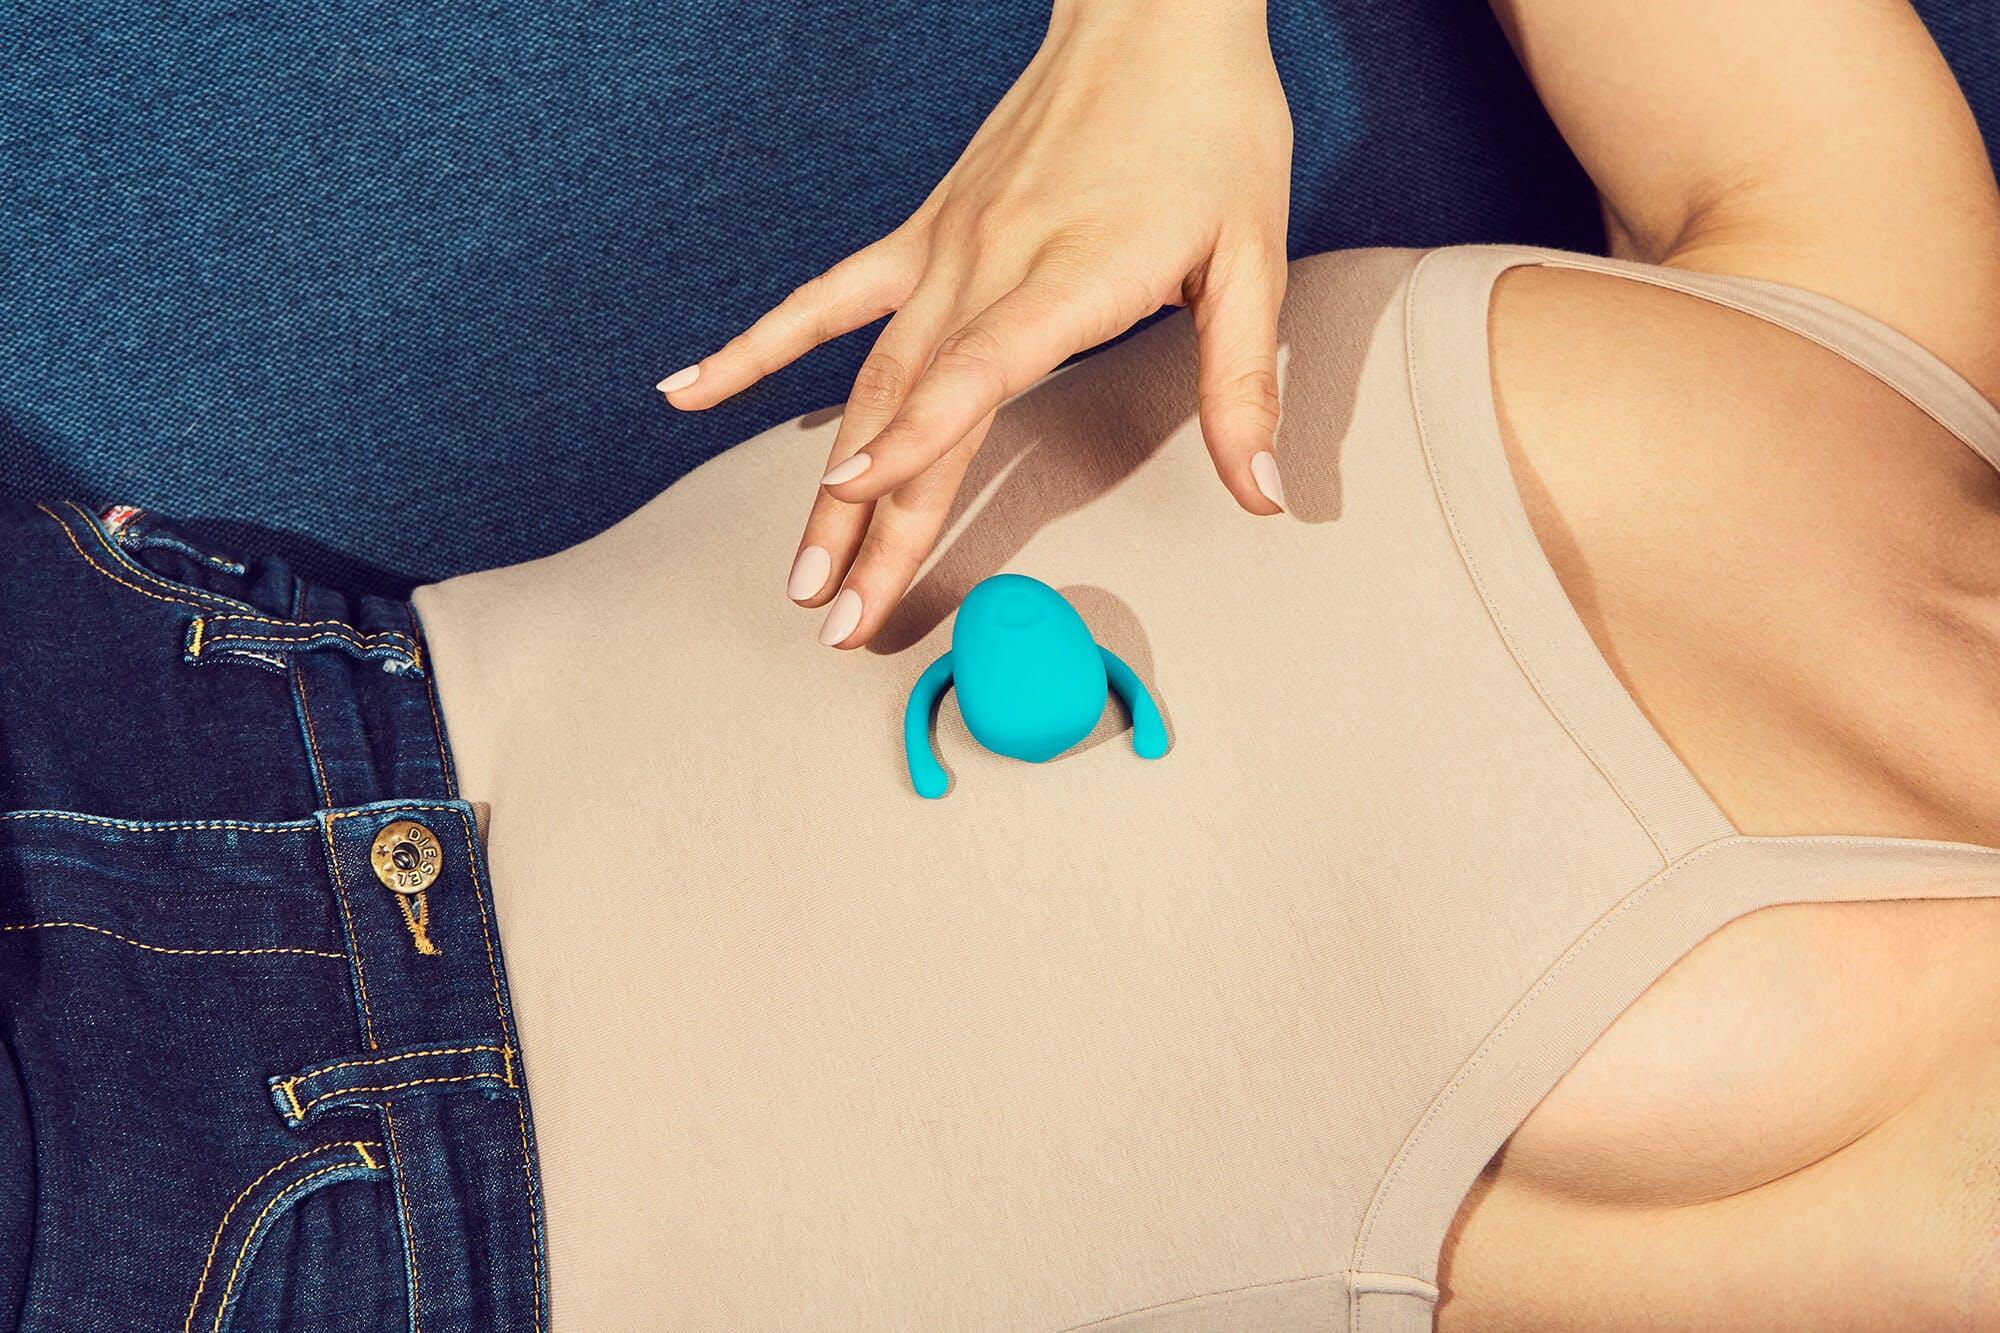 couples sex toys : Dame Eva